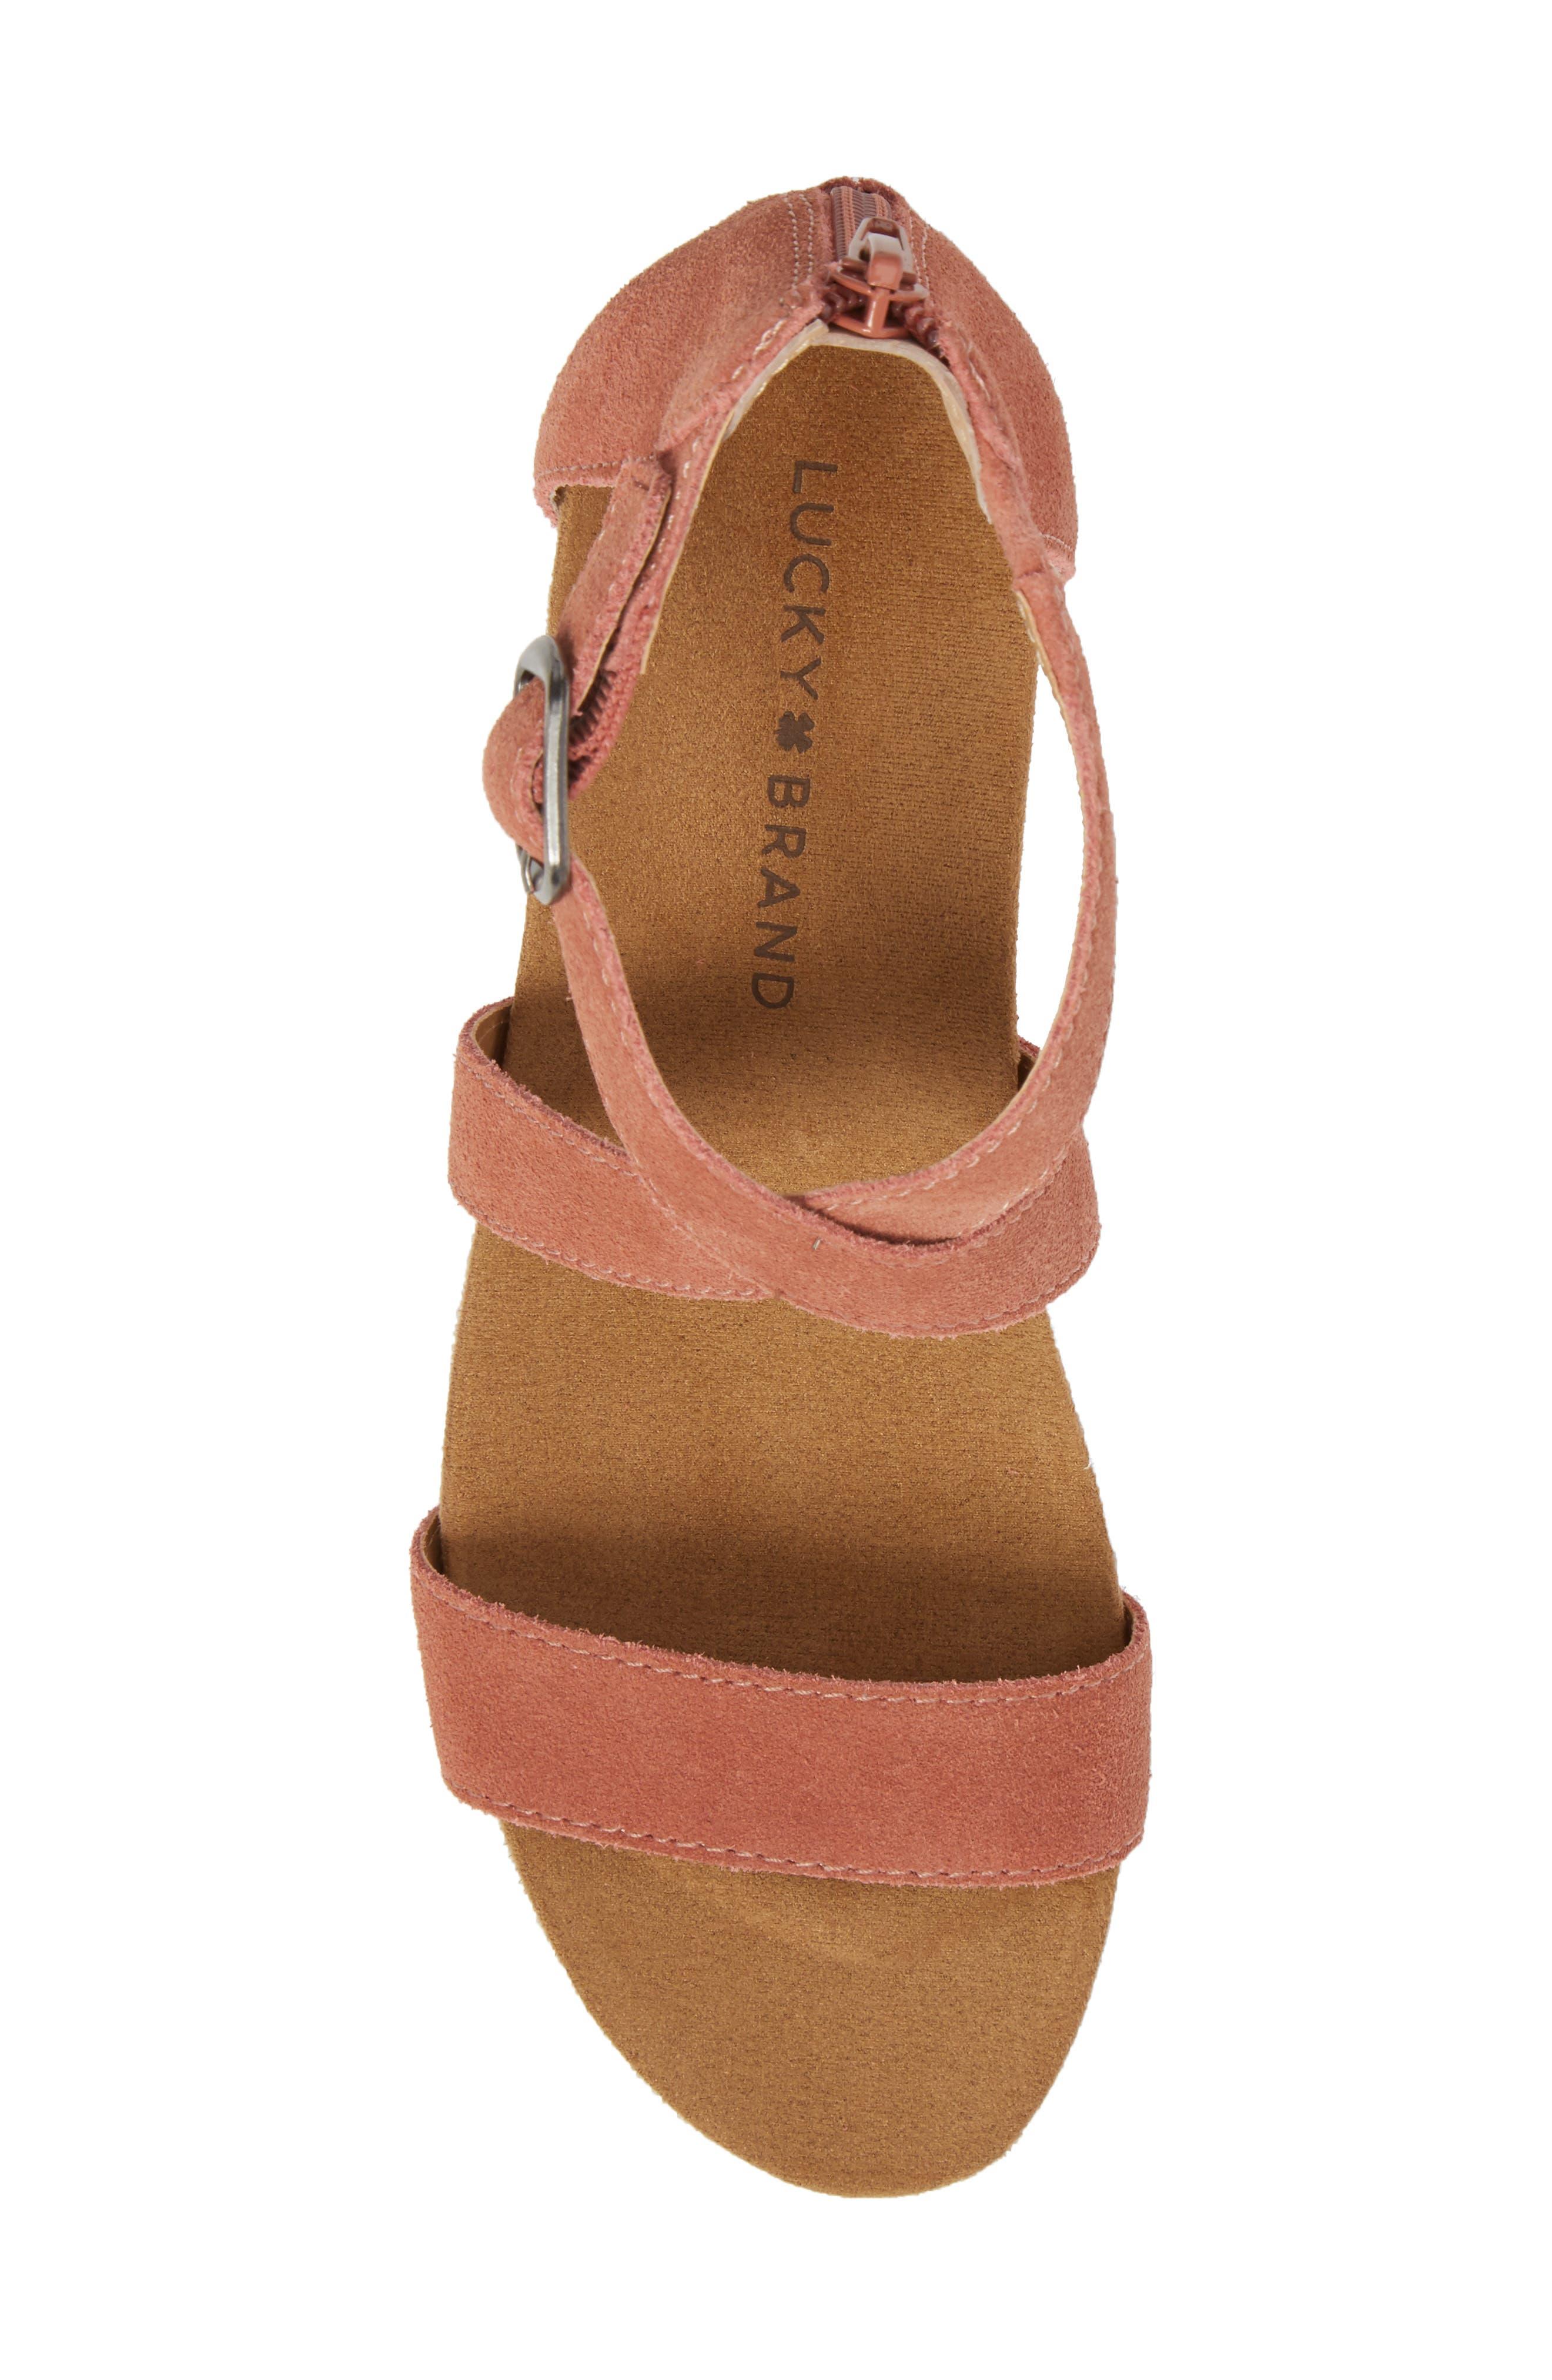 Kenadee Wedge Sandal,                             Alternate thumbnail 5, color,                             Canyon Rose Suede